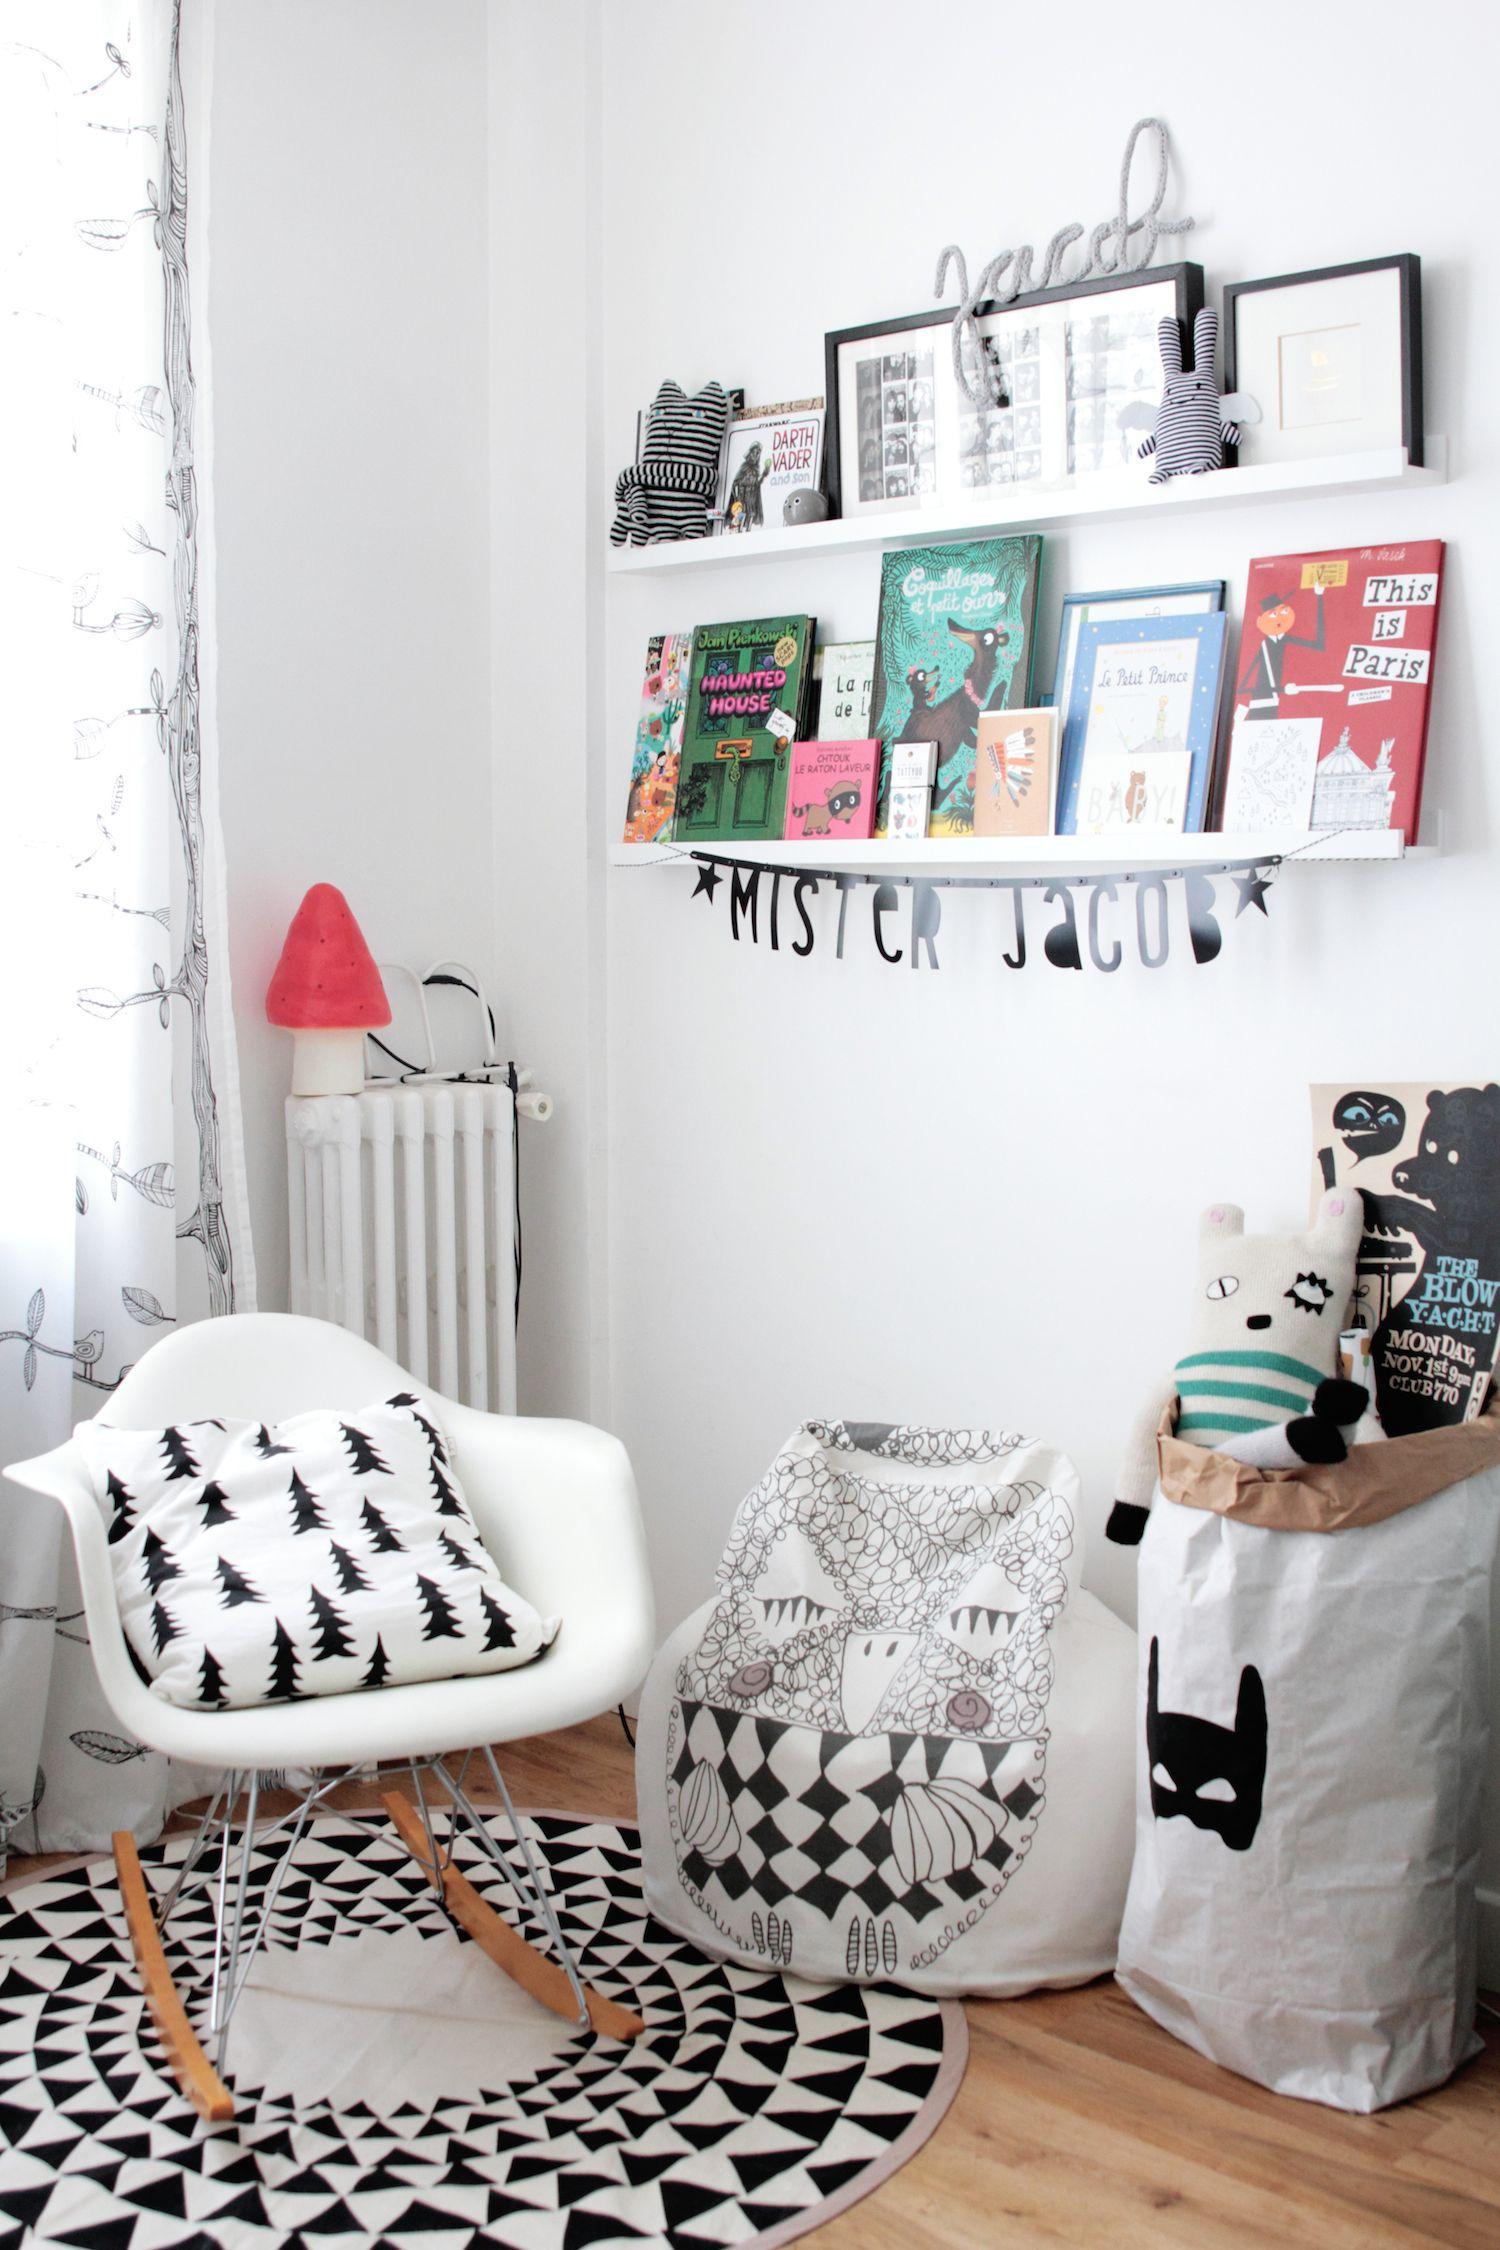 chambre enfant scandinave noir et blanc 2326 chambre enfant scandinave chambre enfant et chambres. Black Bedroom Furniture Sets. Home Design Ideas